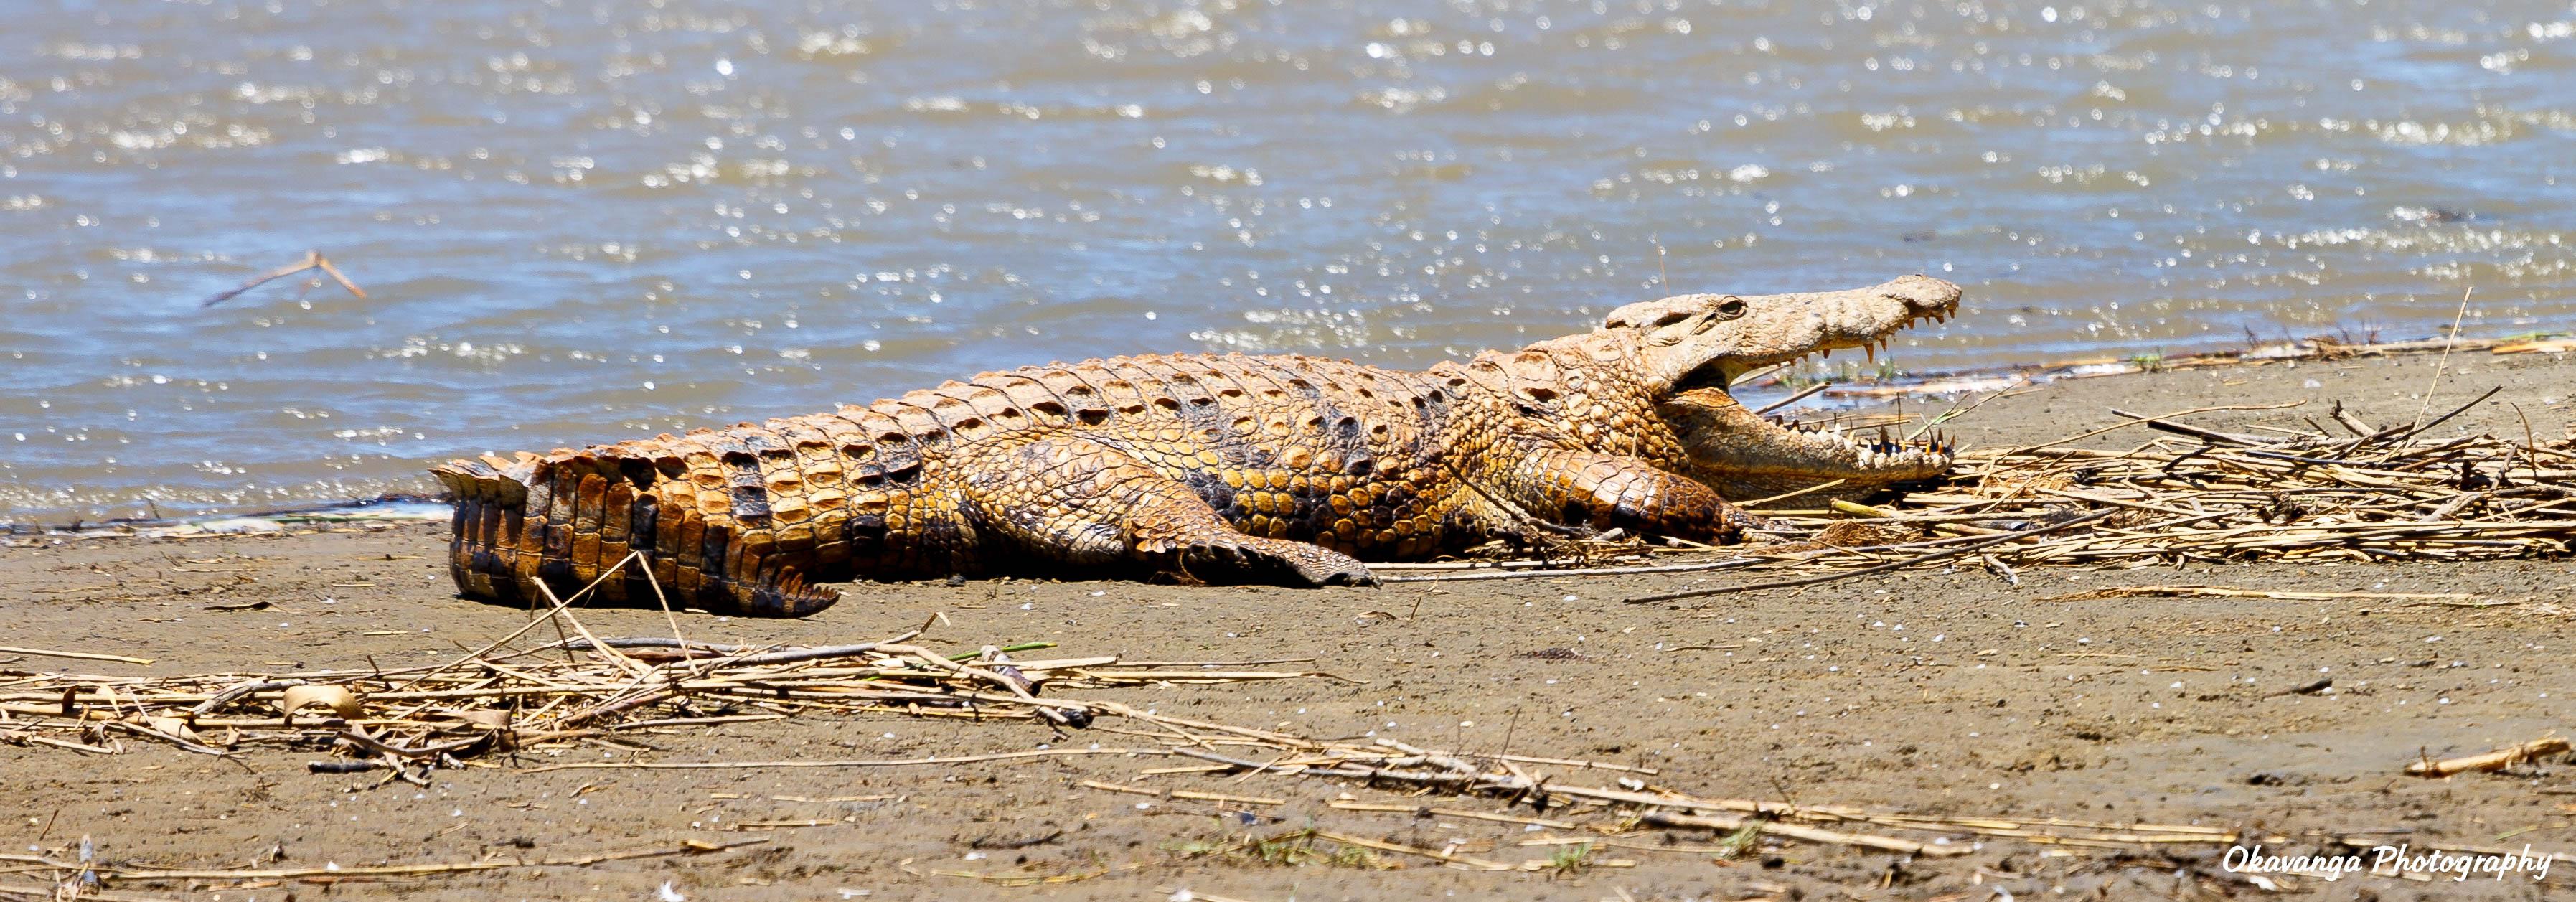 Resting Crocodile by Okavanga